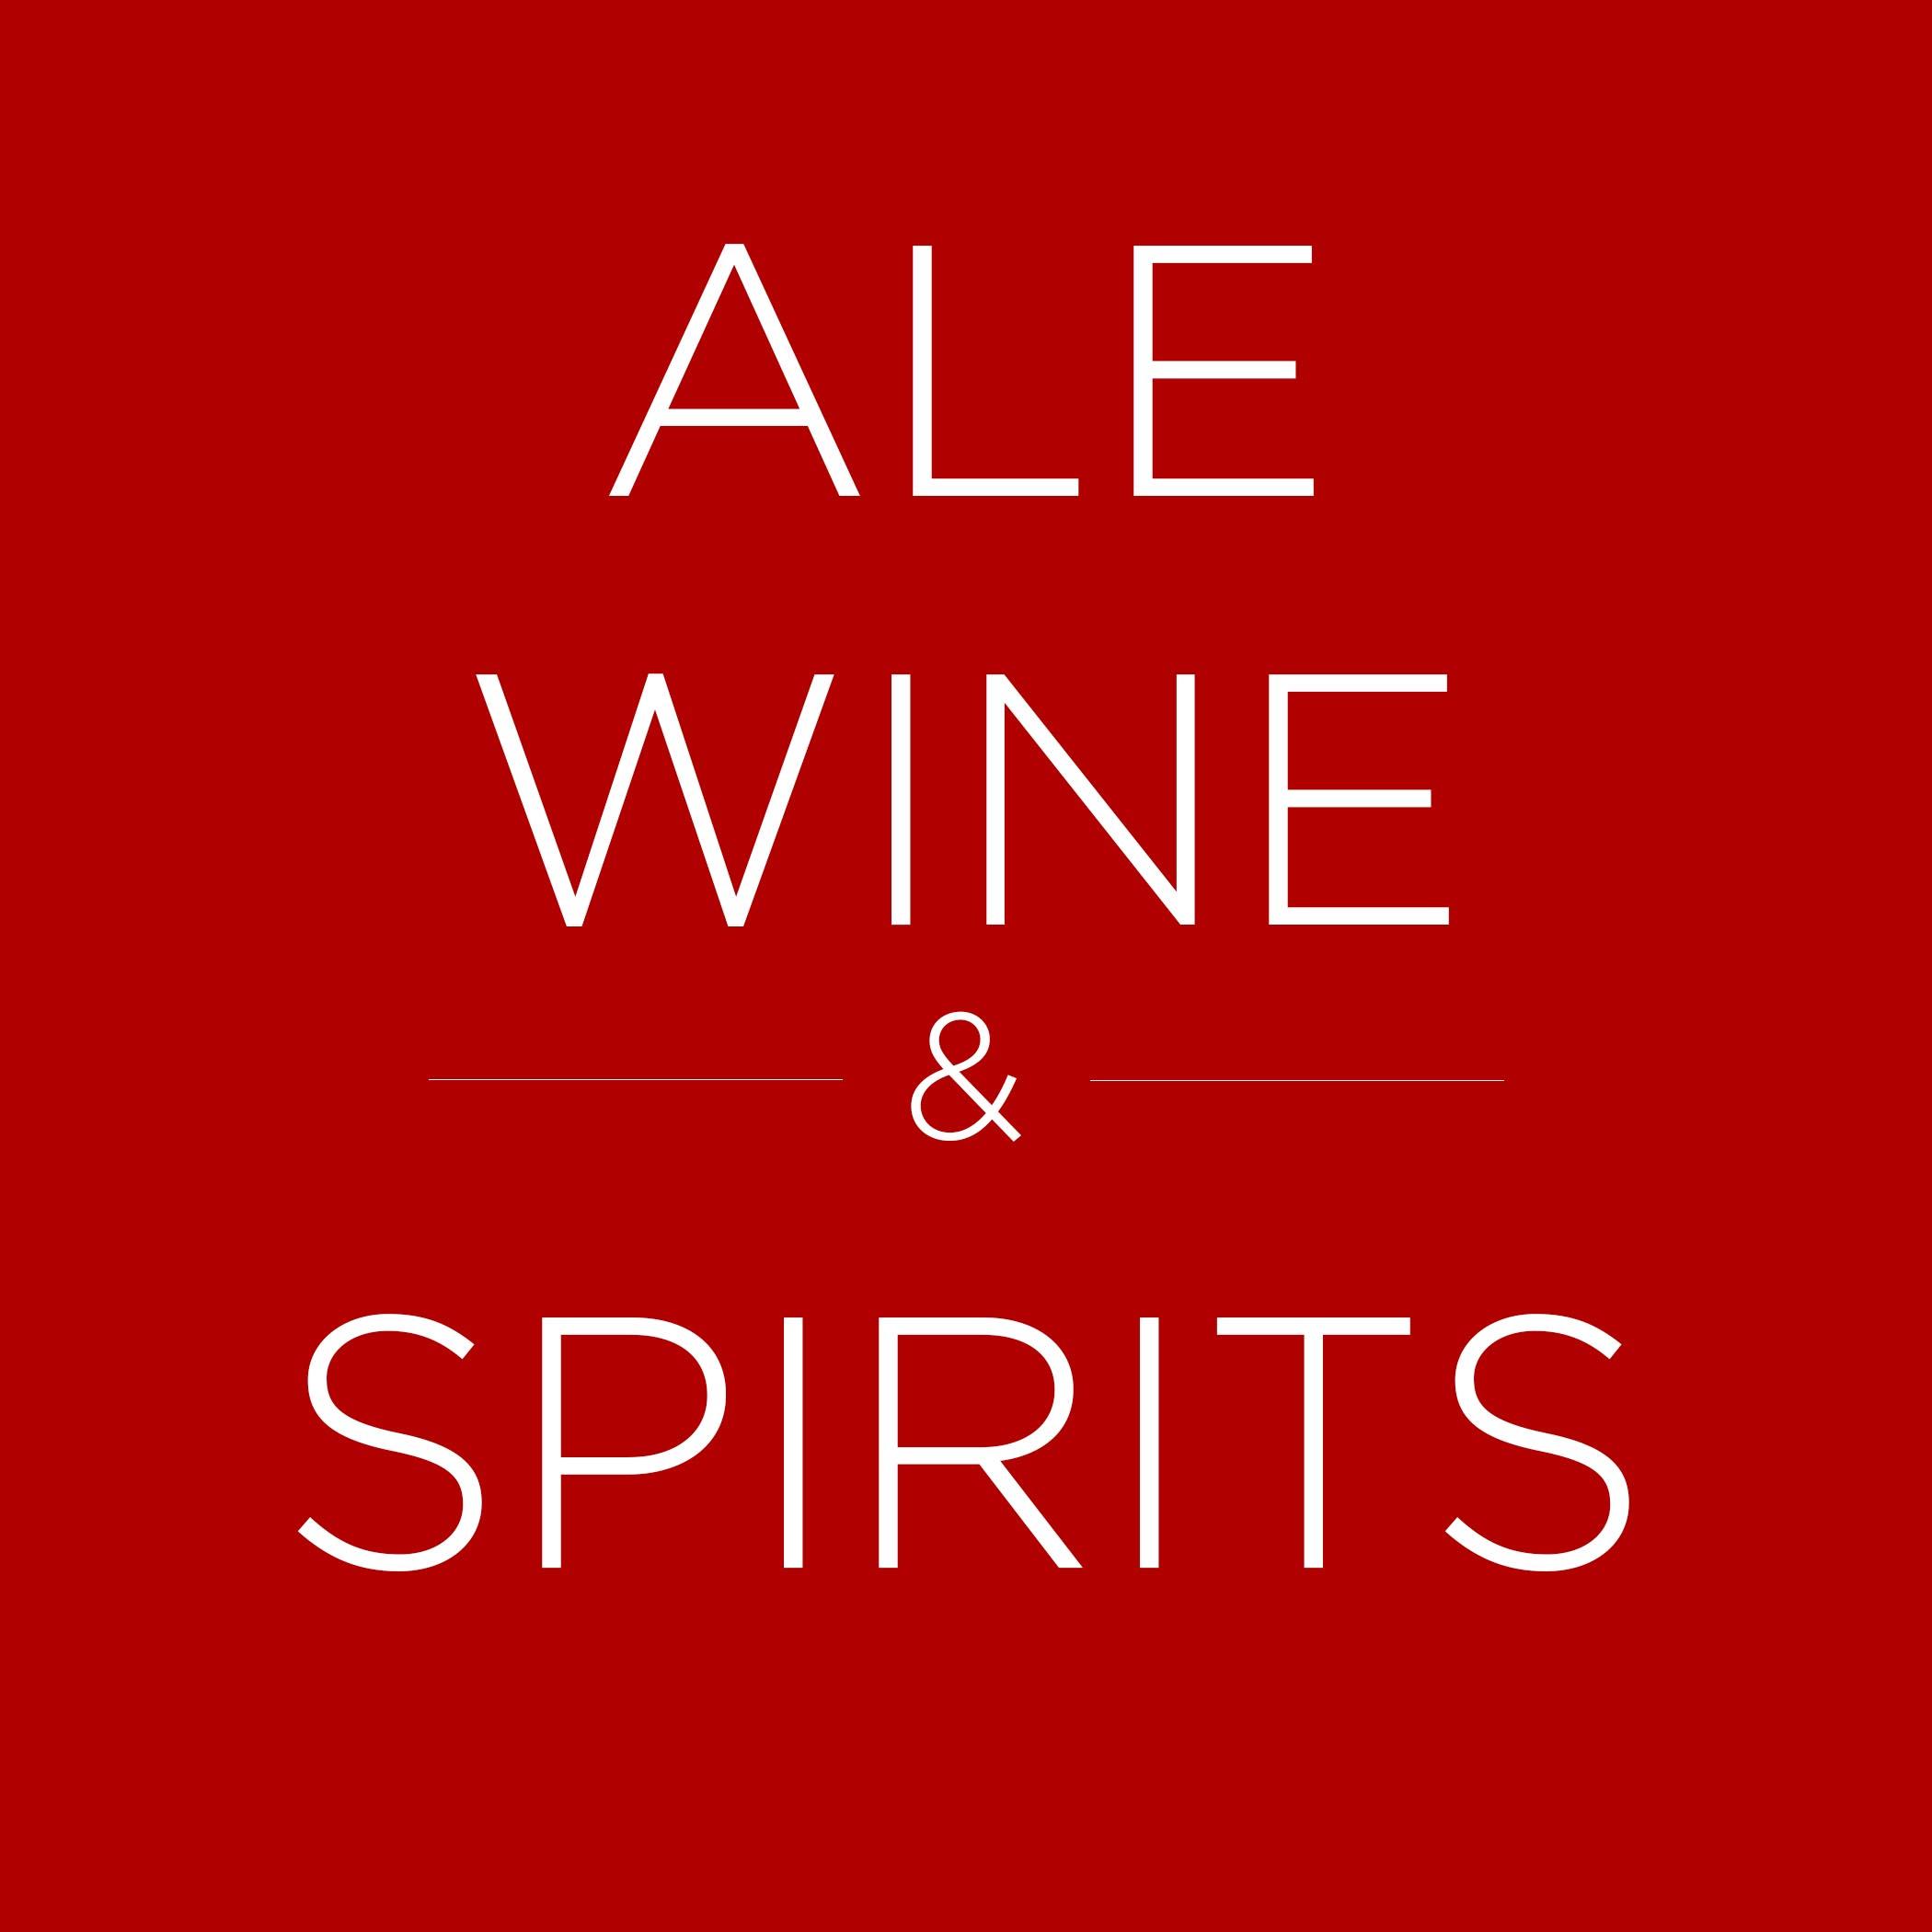 Ale Wine & Spirits.jpg